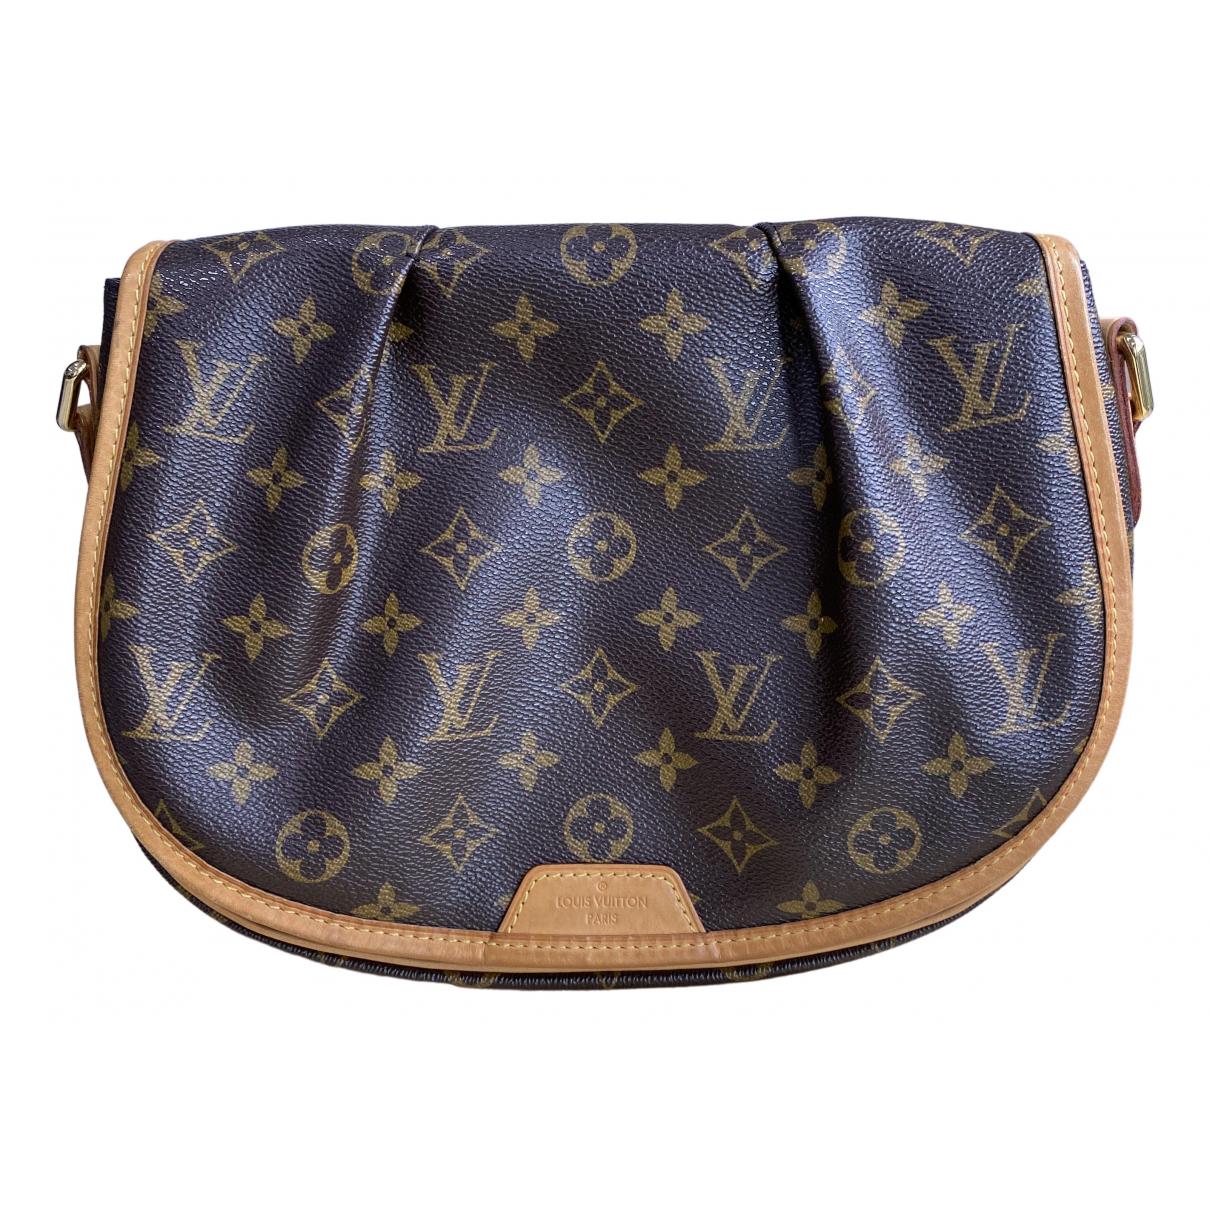 Louis Vuitton Menilmontant  Brown Cloth handbag for Women N